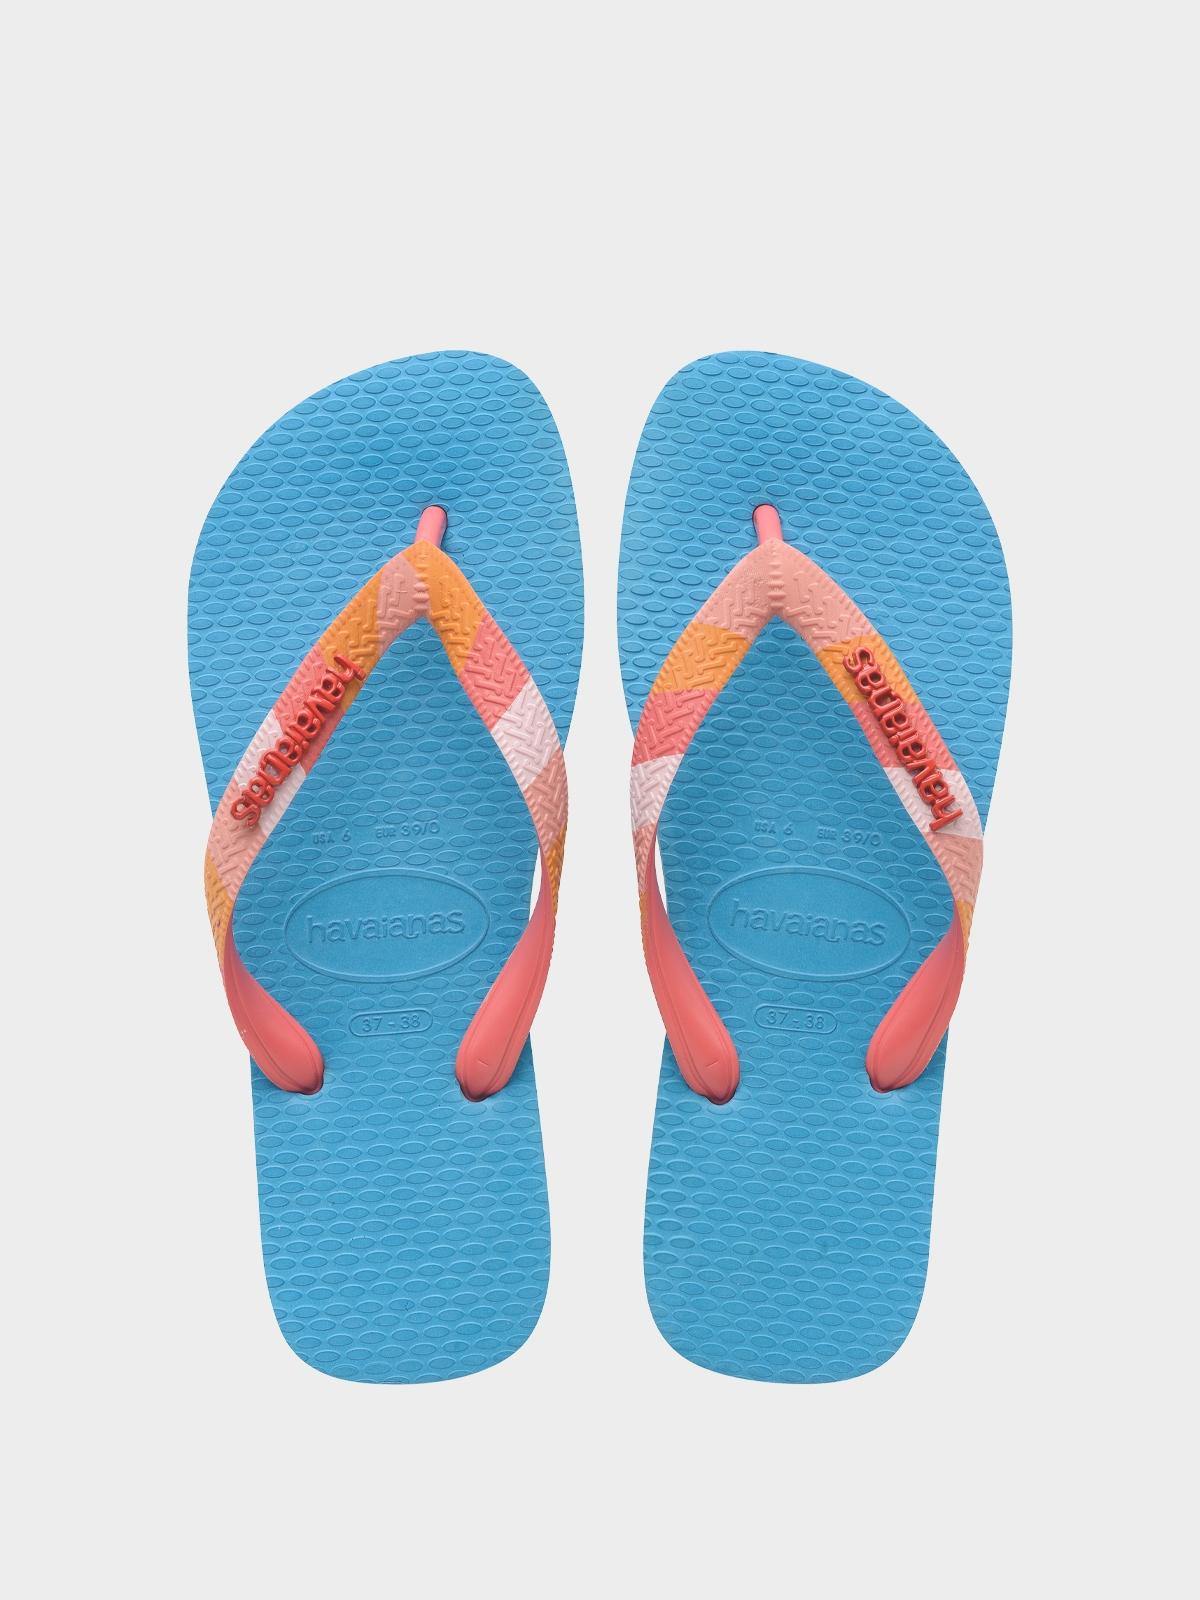 Havaianas Top Logo Metallic Sandals Black